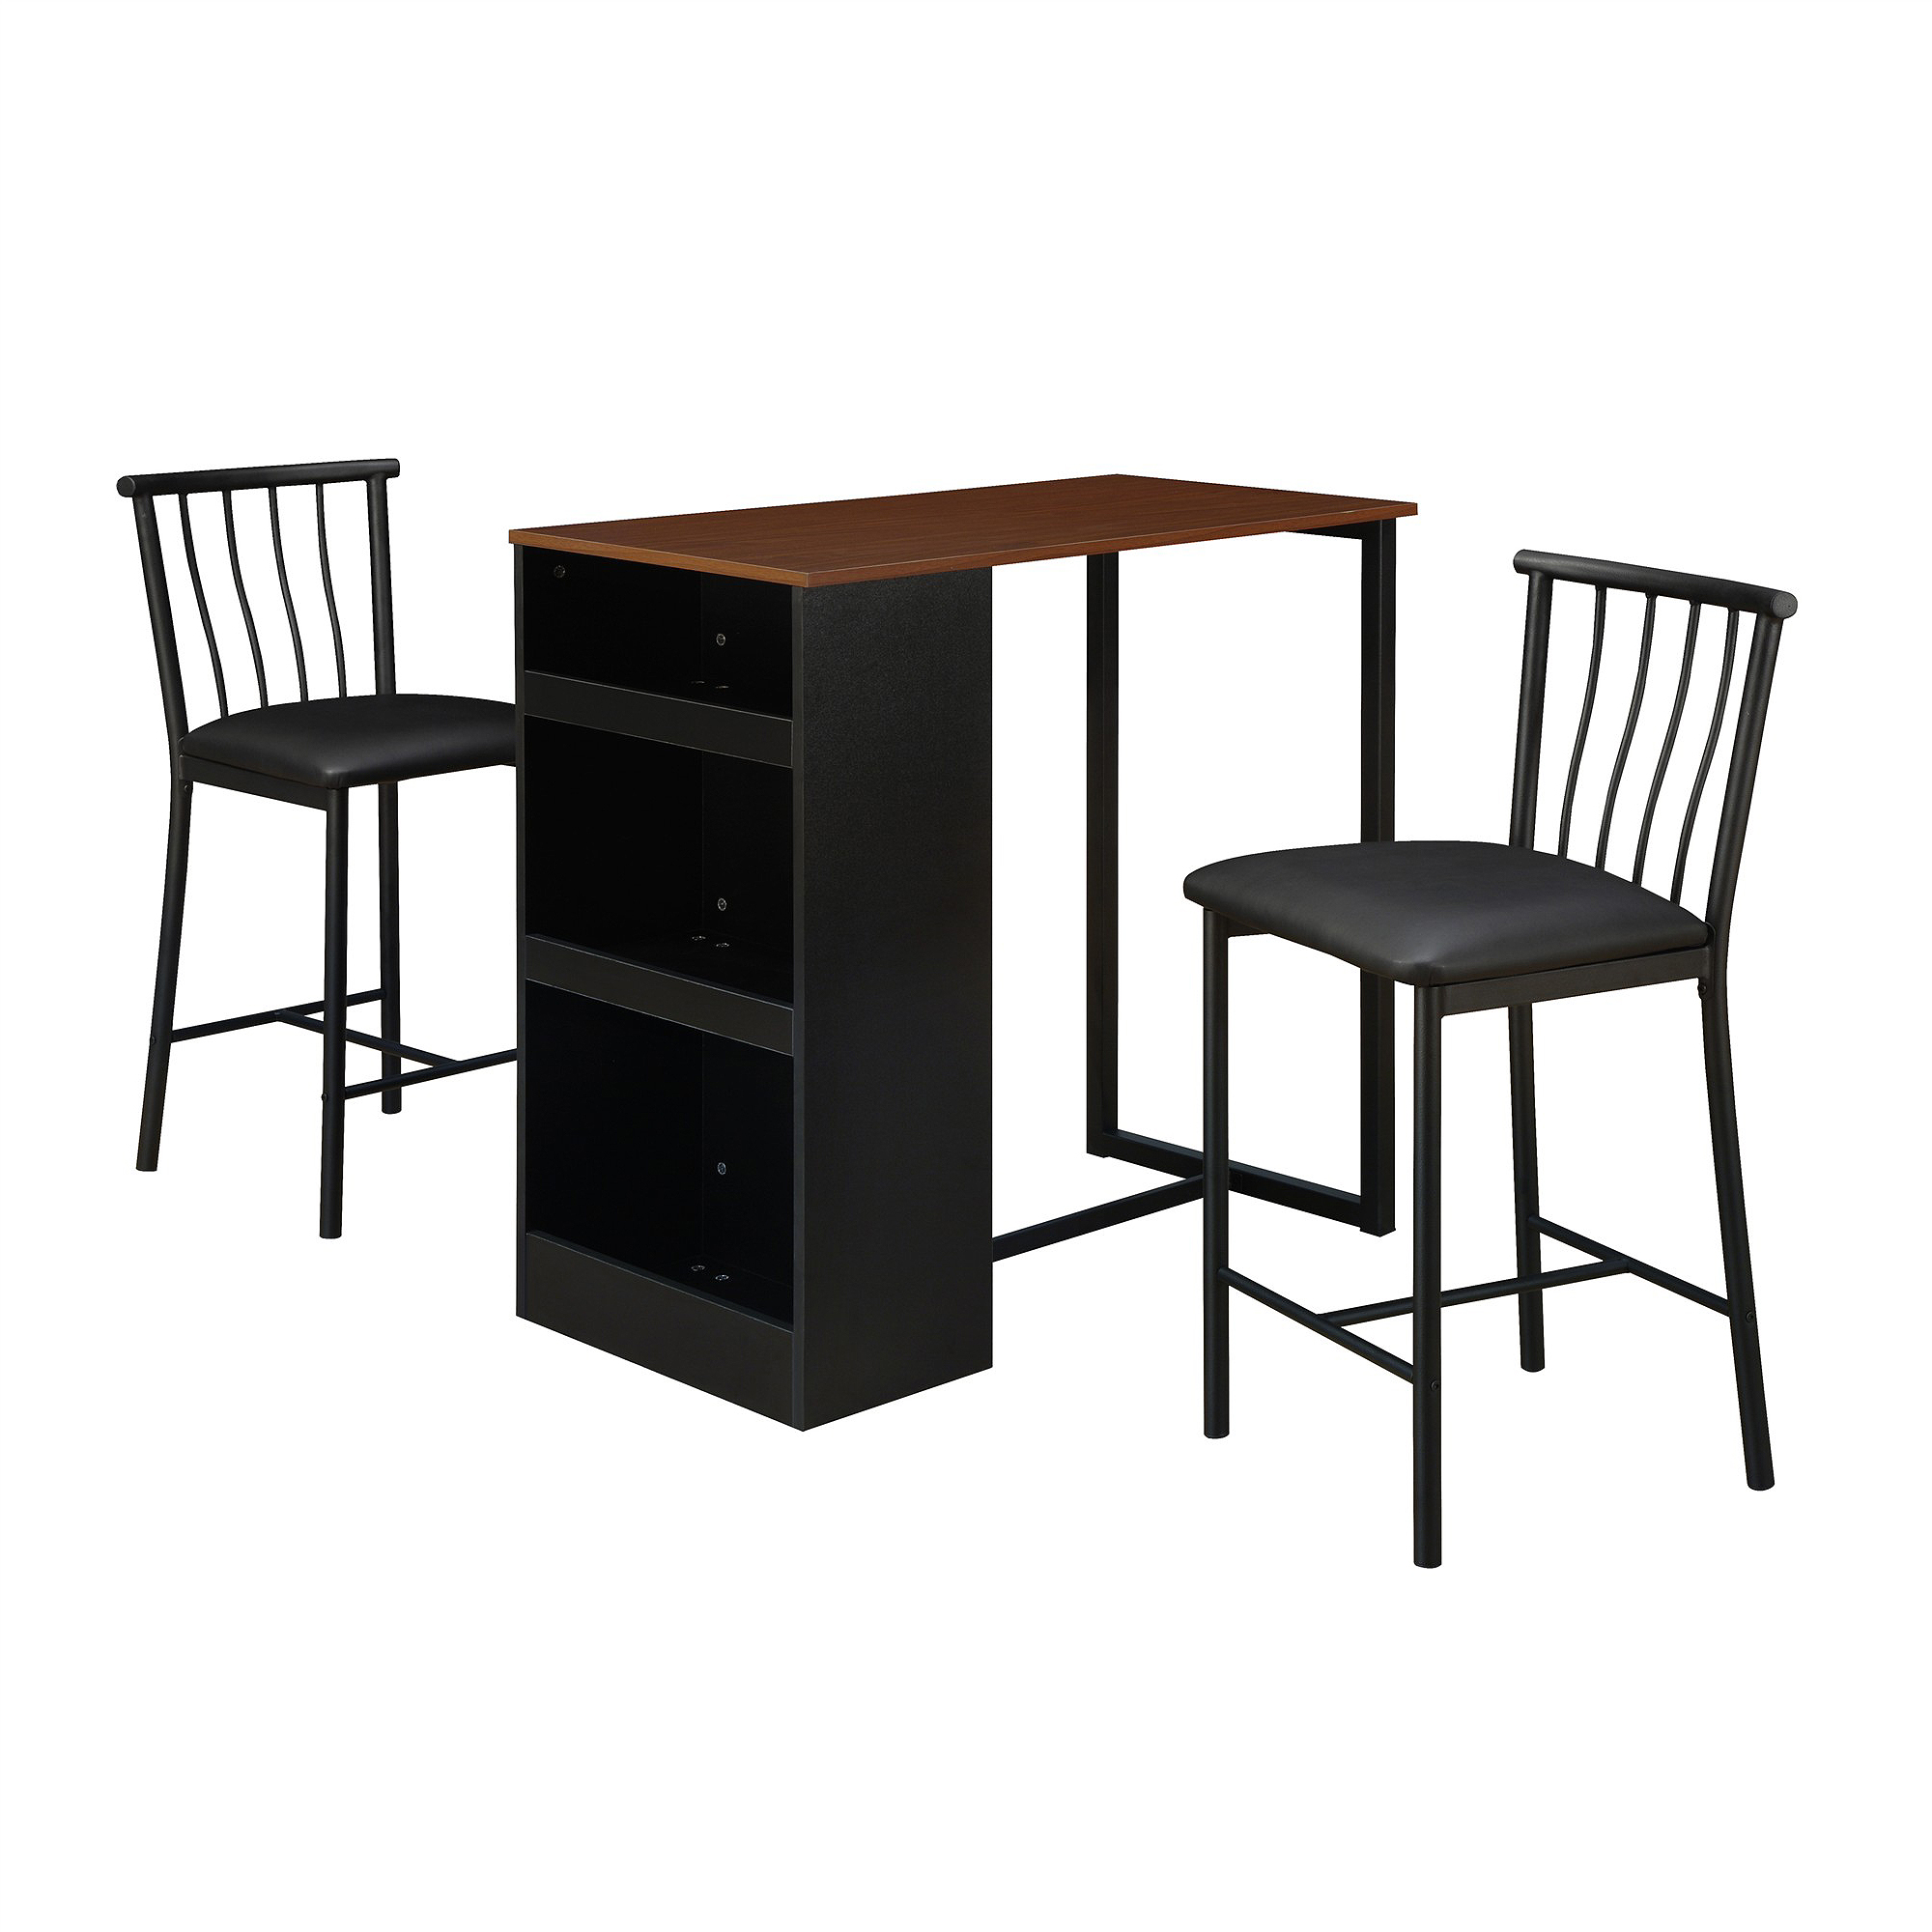 Dorel Living Isla 3-Piece Counter Height Dining Set with Storage, Espresso